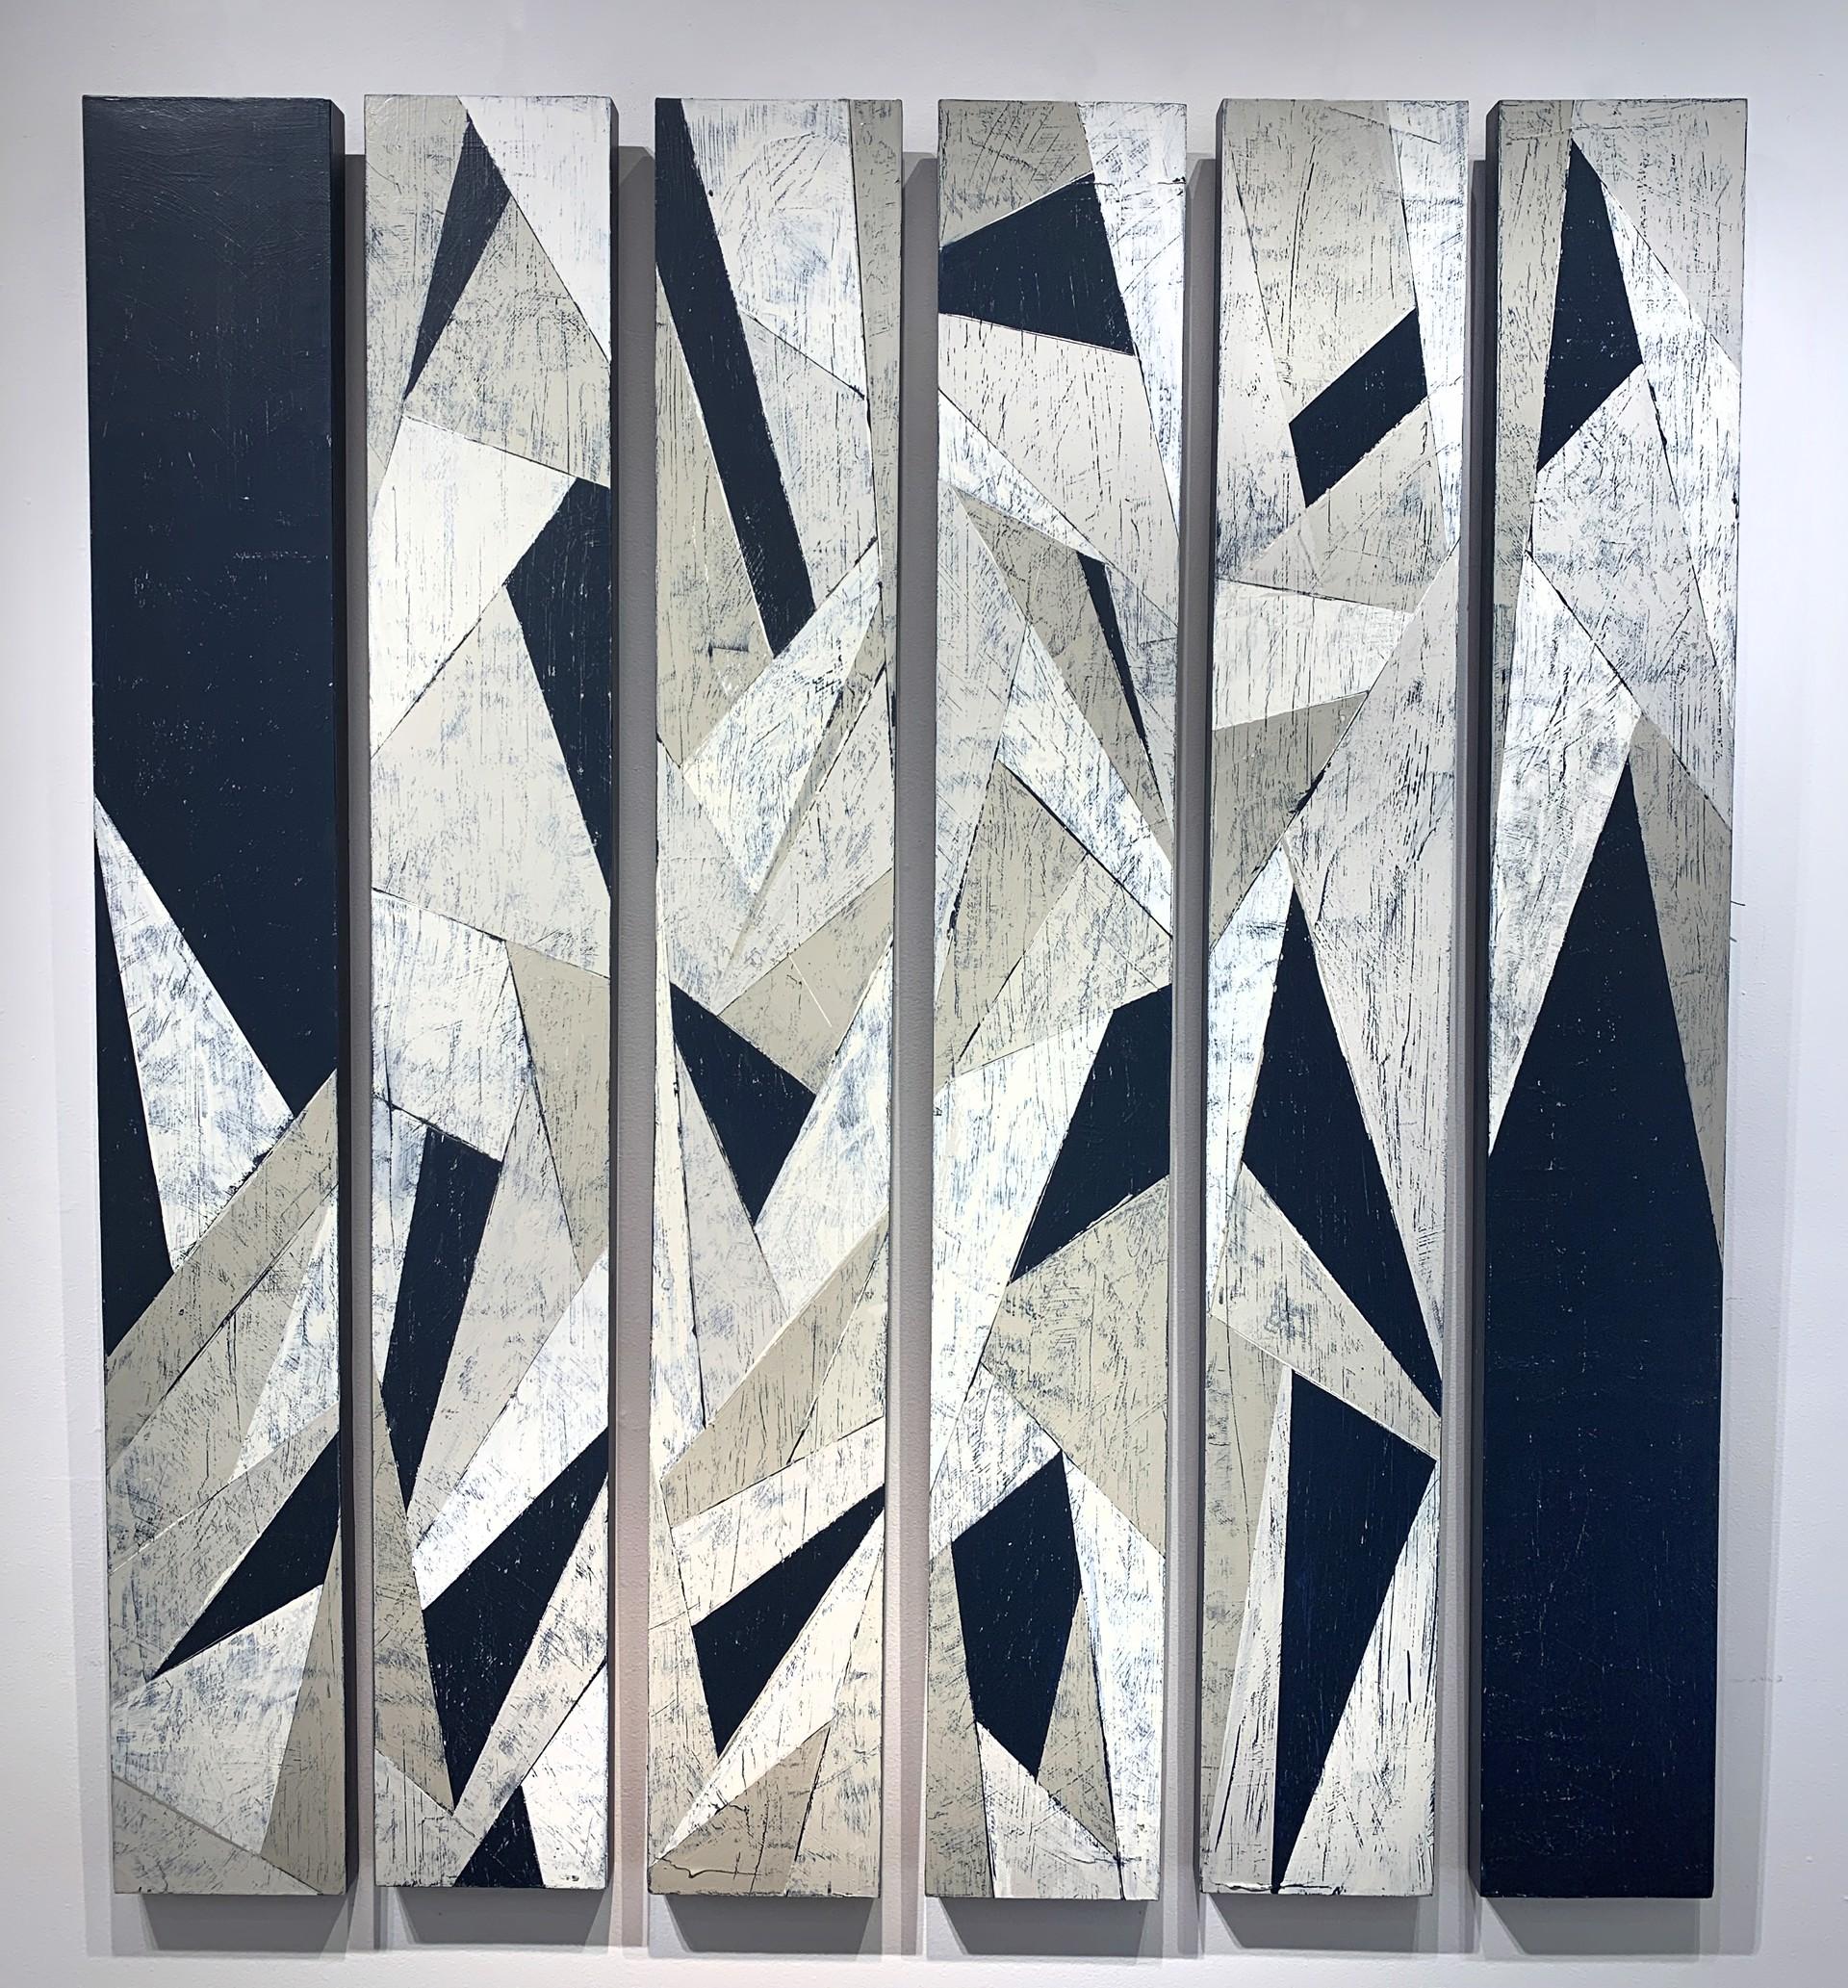 Faccetta IV (Navy/Tan) (6 Panel) by Ann Griffith